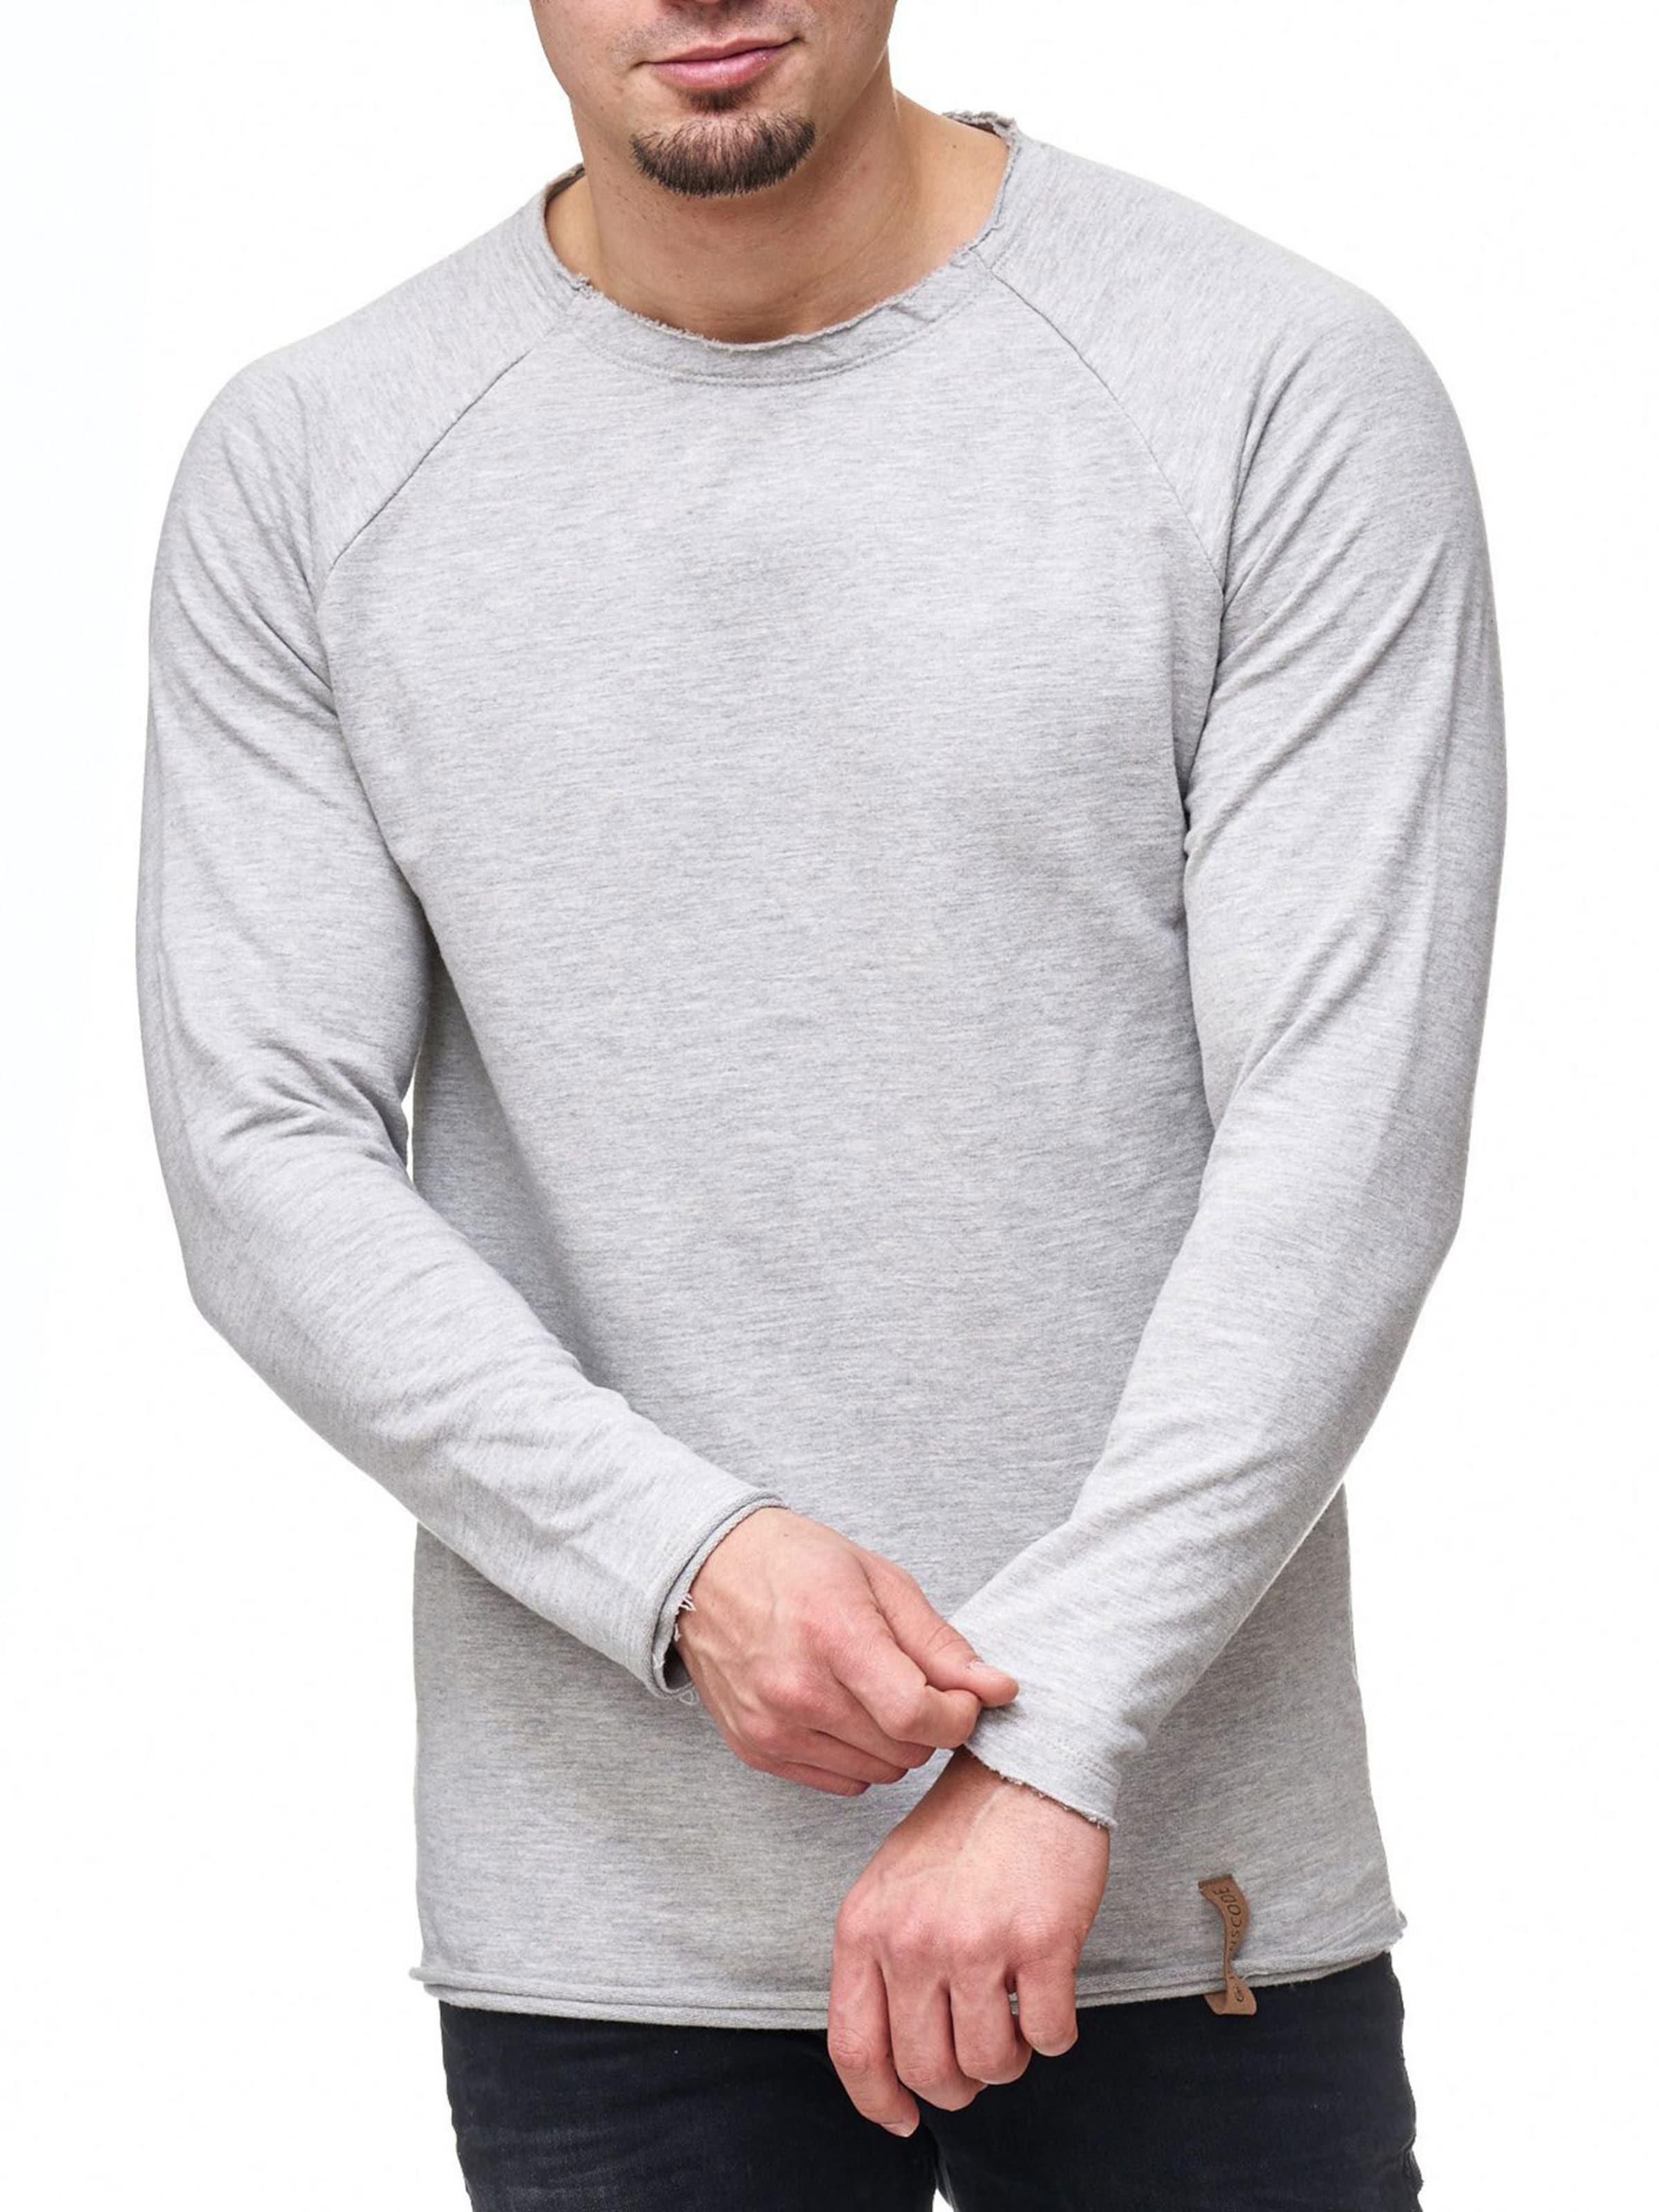 Recife Clair T ' Gris shirt En Indicode Jeans xBshQrdtC